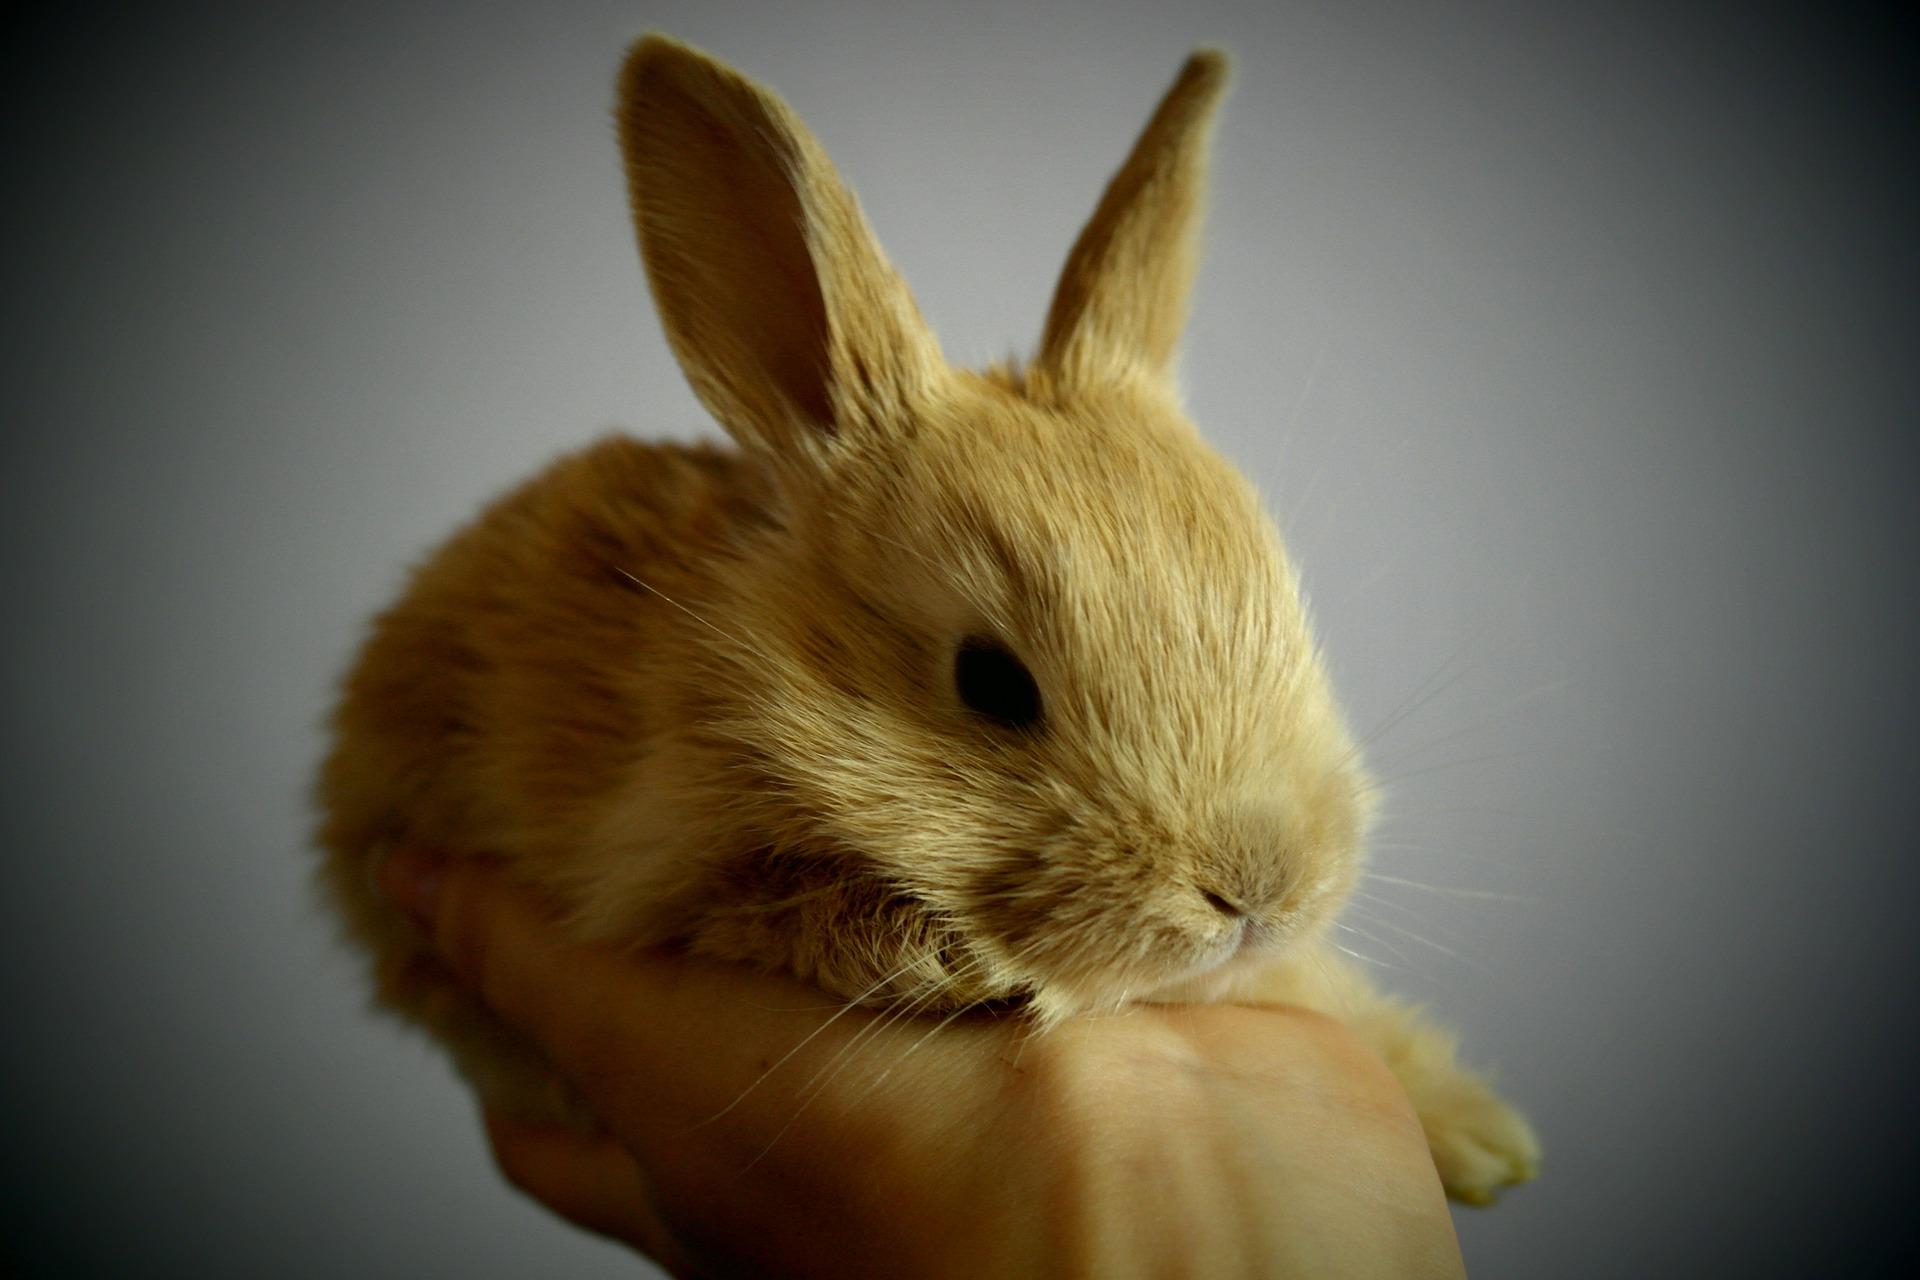 kokzidiose beim kaninchen definition ursachen symptome tiermedizinportal. Black Bedroom Furniture Sets. Home Design Ideas